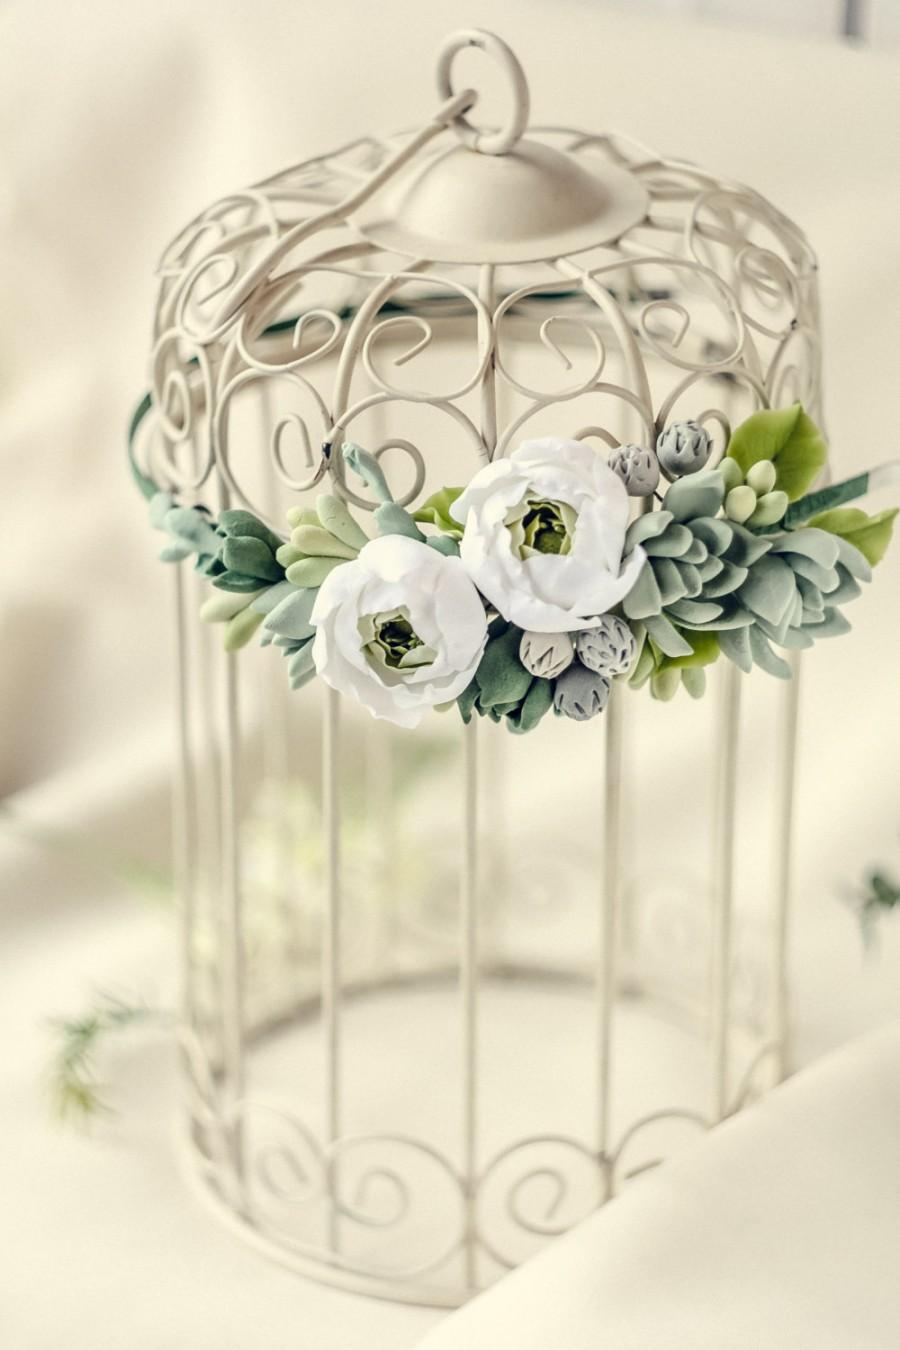 Mariage - BF-25% Succulents head crown Rustic Flower Winter Wedding wreath Bohemian Greenery  Bridal head piece Wedding headpiece succulent jewelry